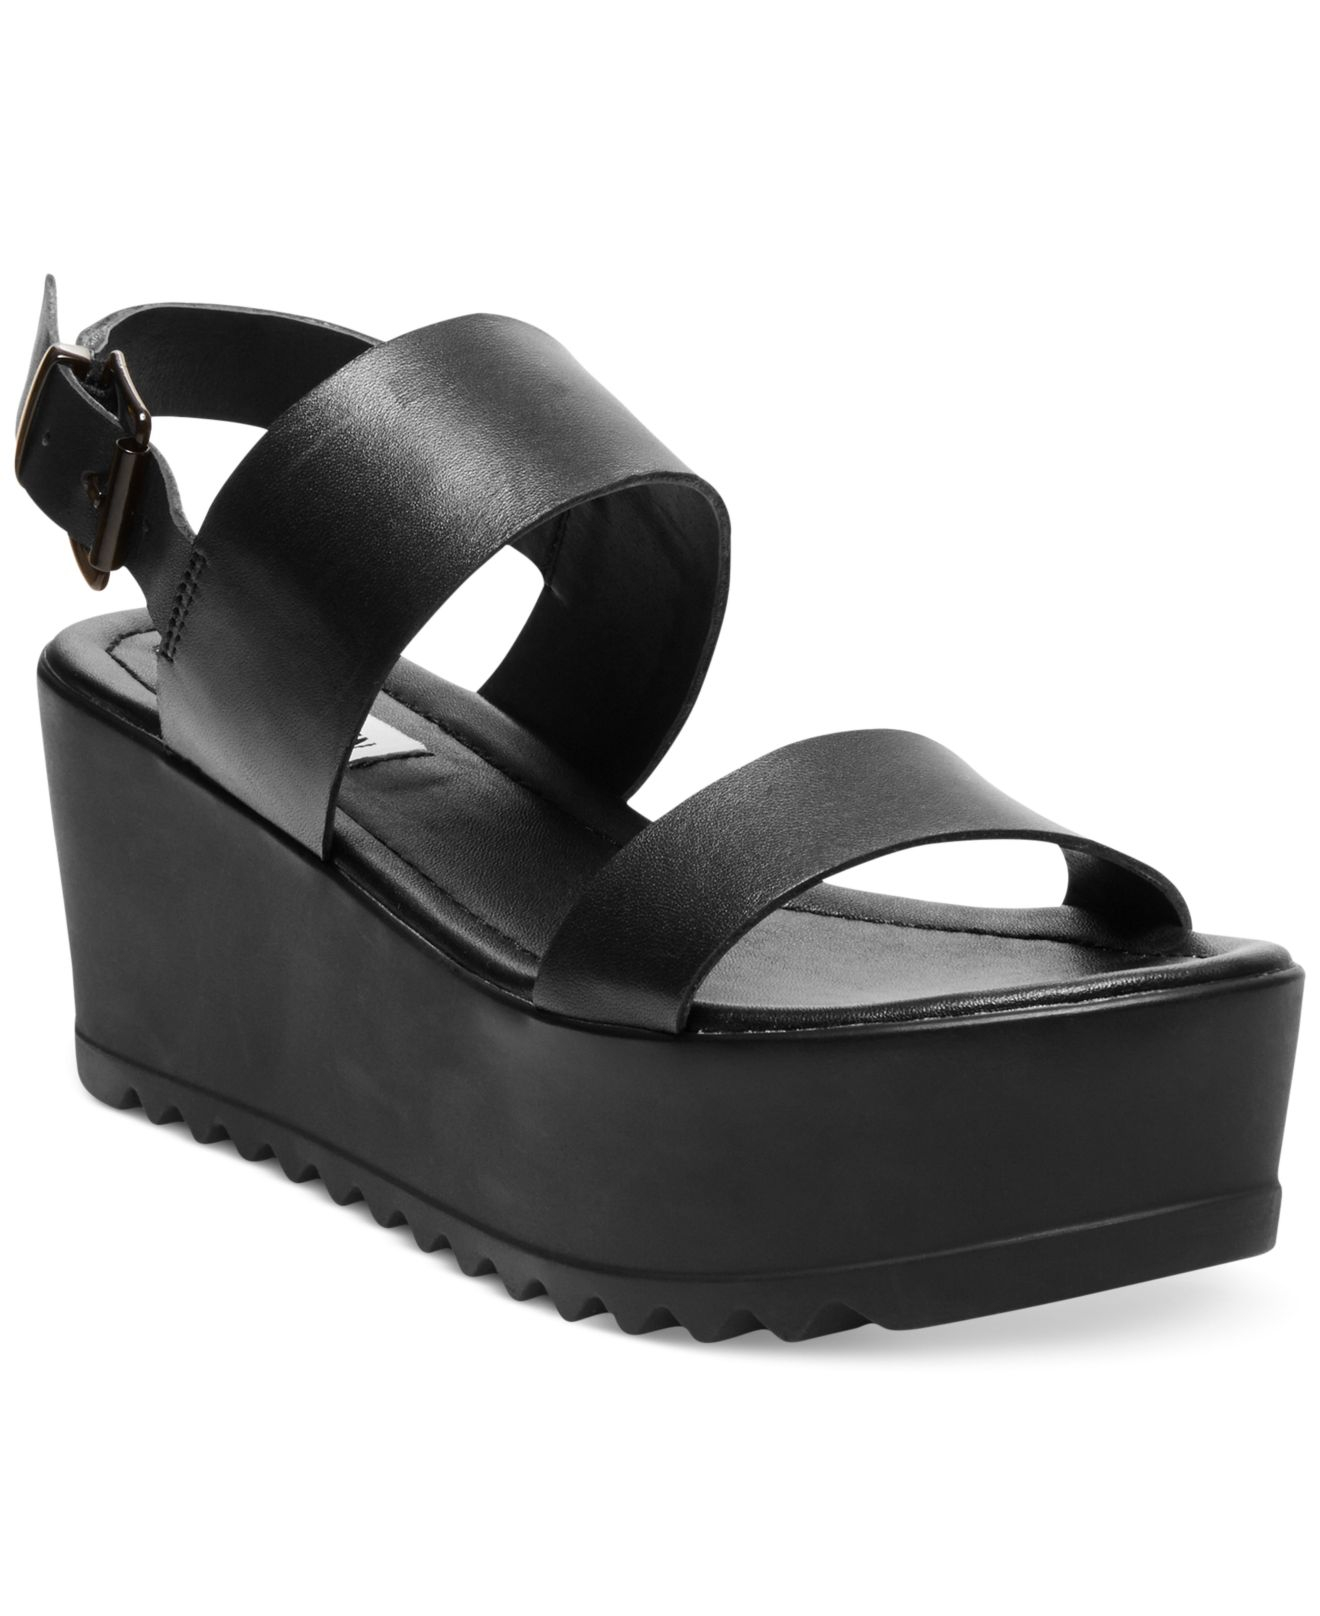 d33d908bd95c2 Lyst - Steve Madden Women S Wave Two-Piece Platform Wedge Sandals in ...